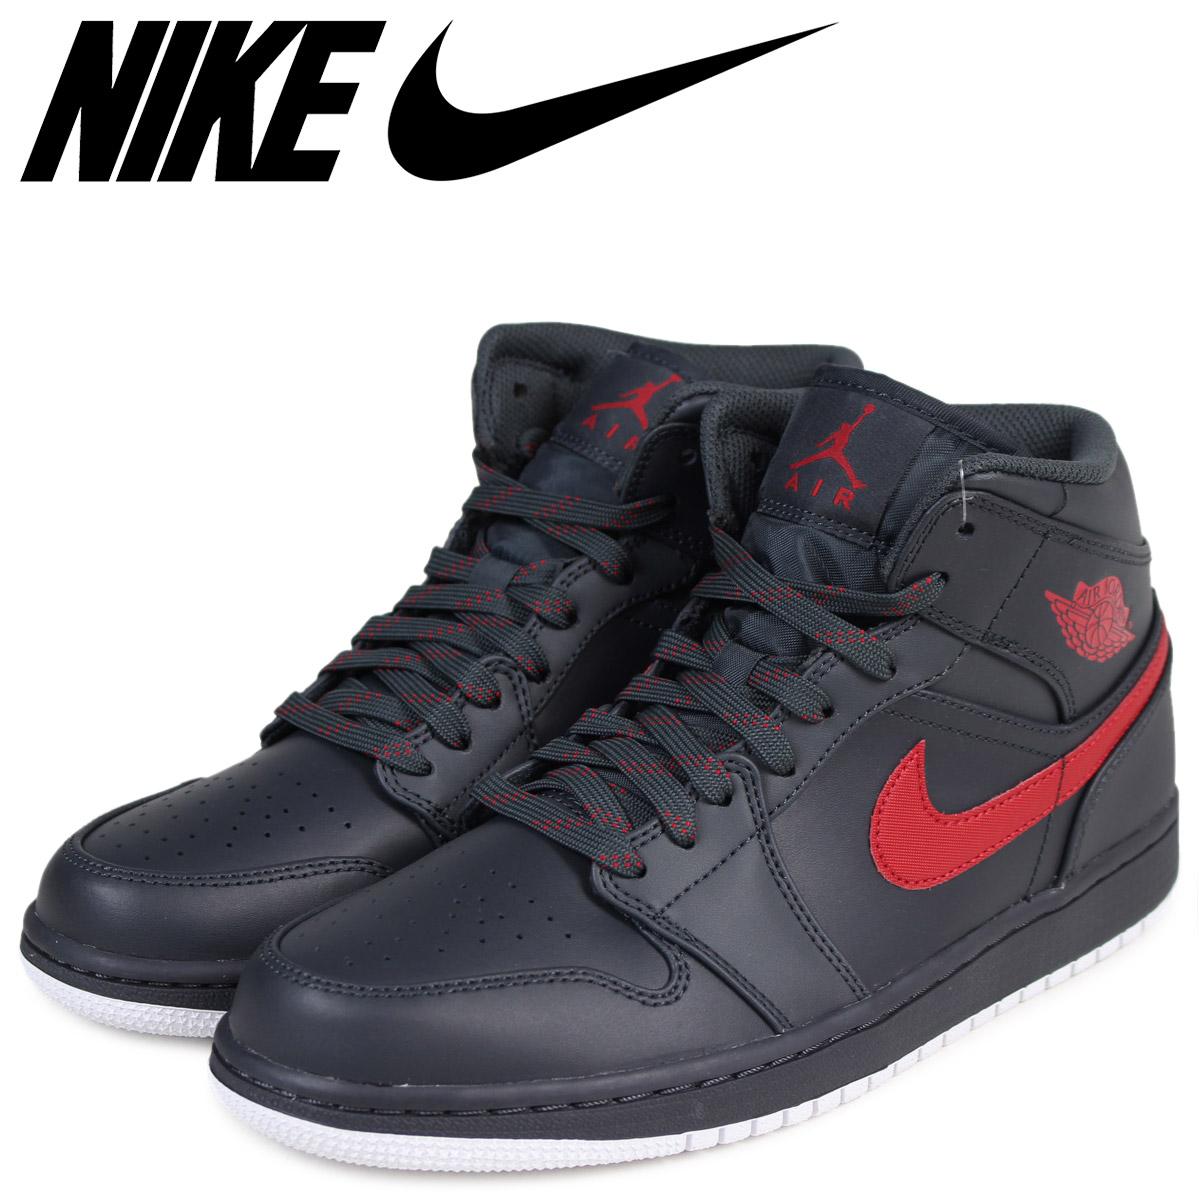 fcecec6db10 Sugar Online Shop: NIKE Nike Air Jordan 1 sneakers AIR JORDAN 1 MID  554,724-045 men's shoes black [load planned Shinnyu load in reservation  product 10/13 ...